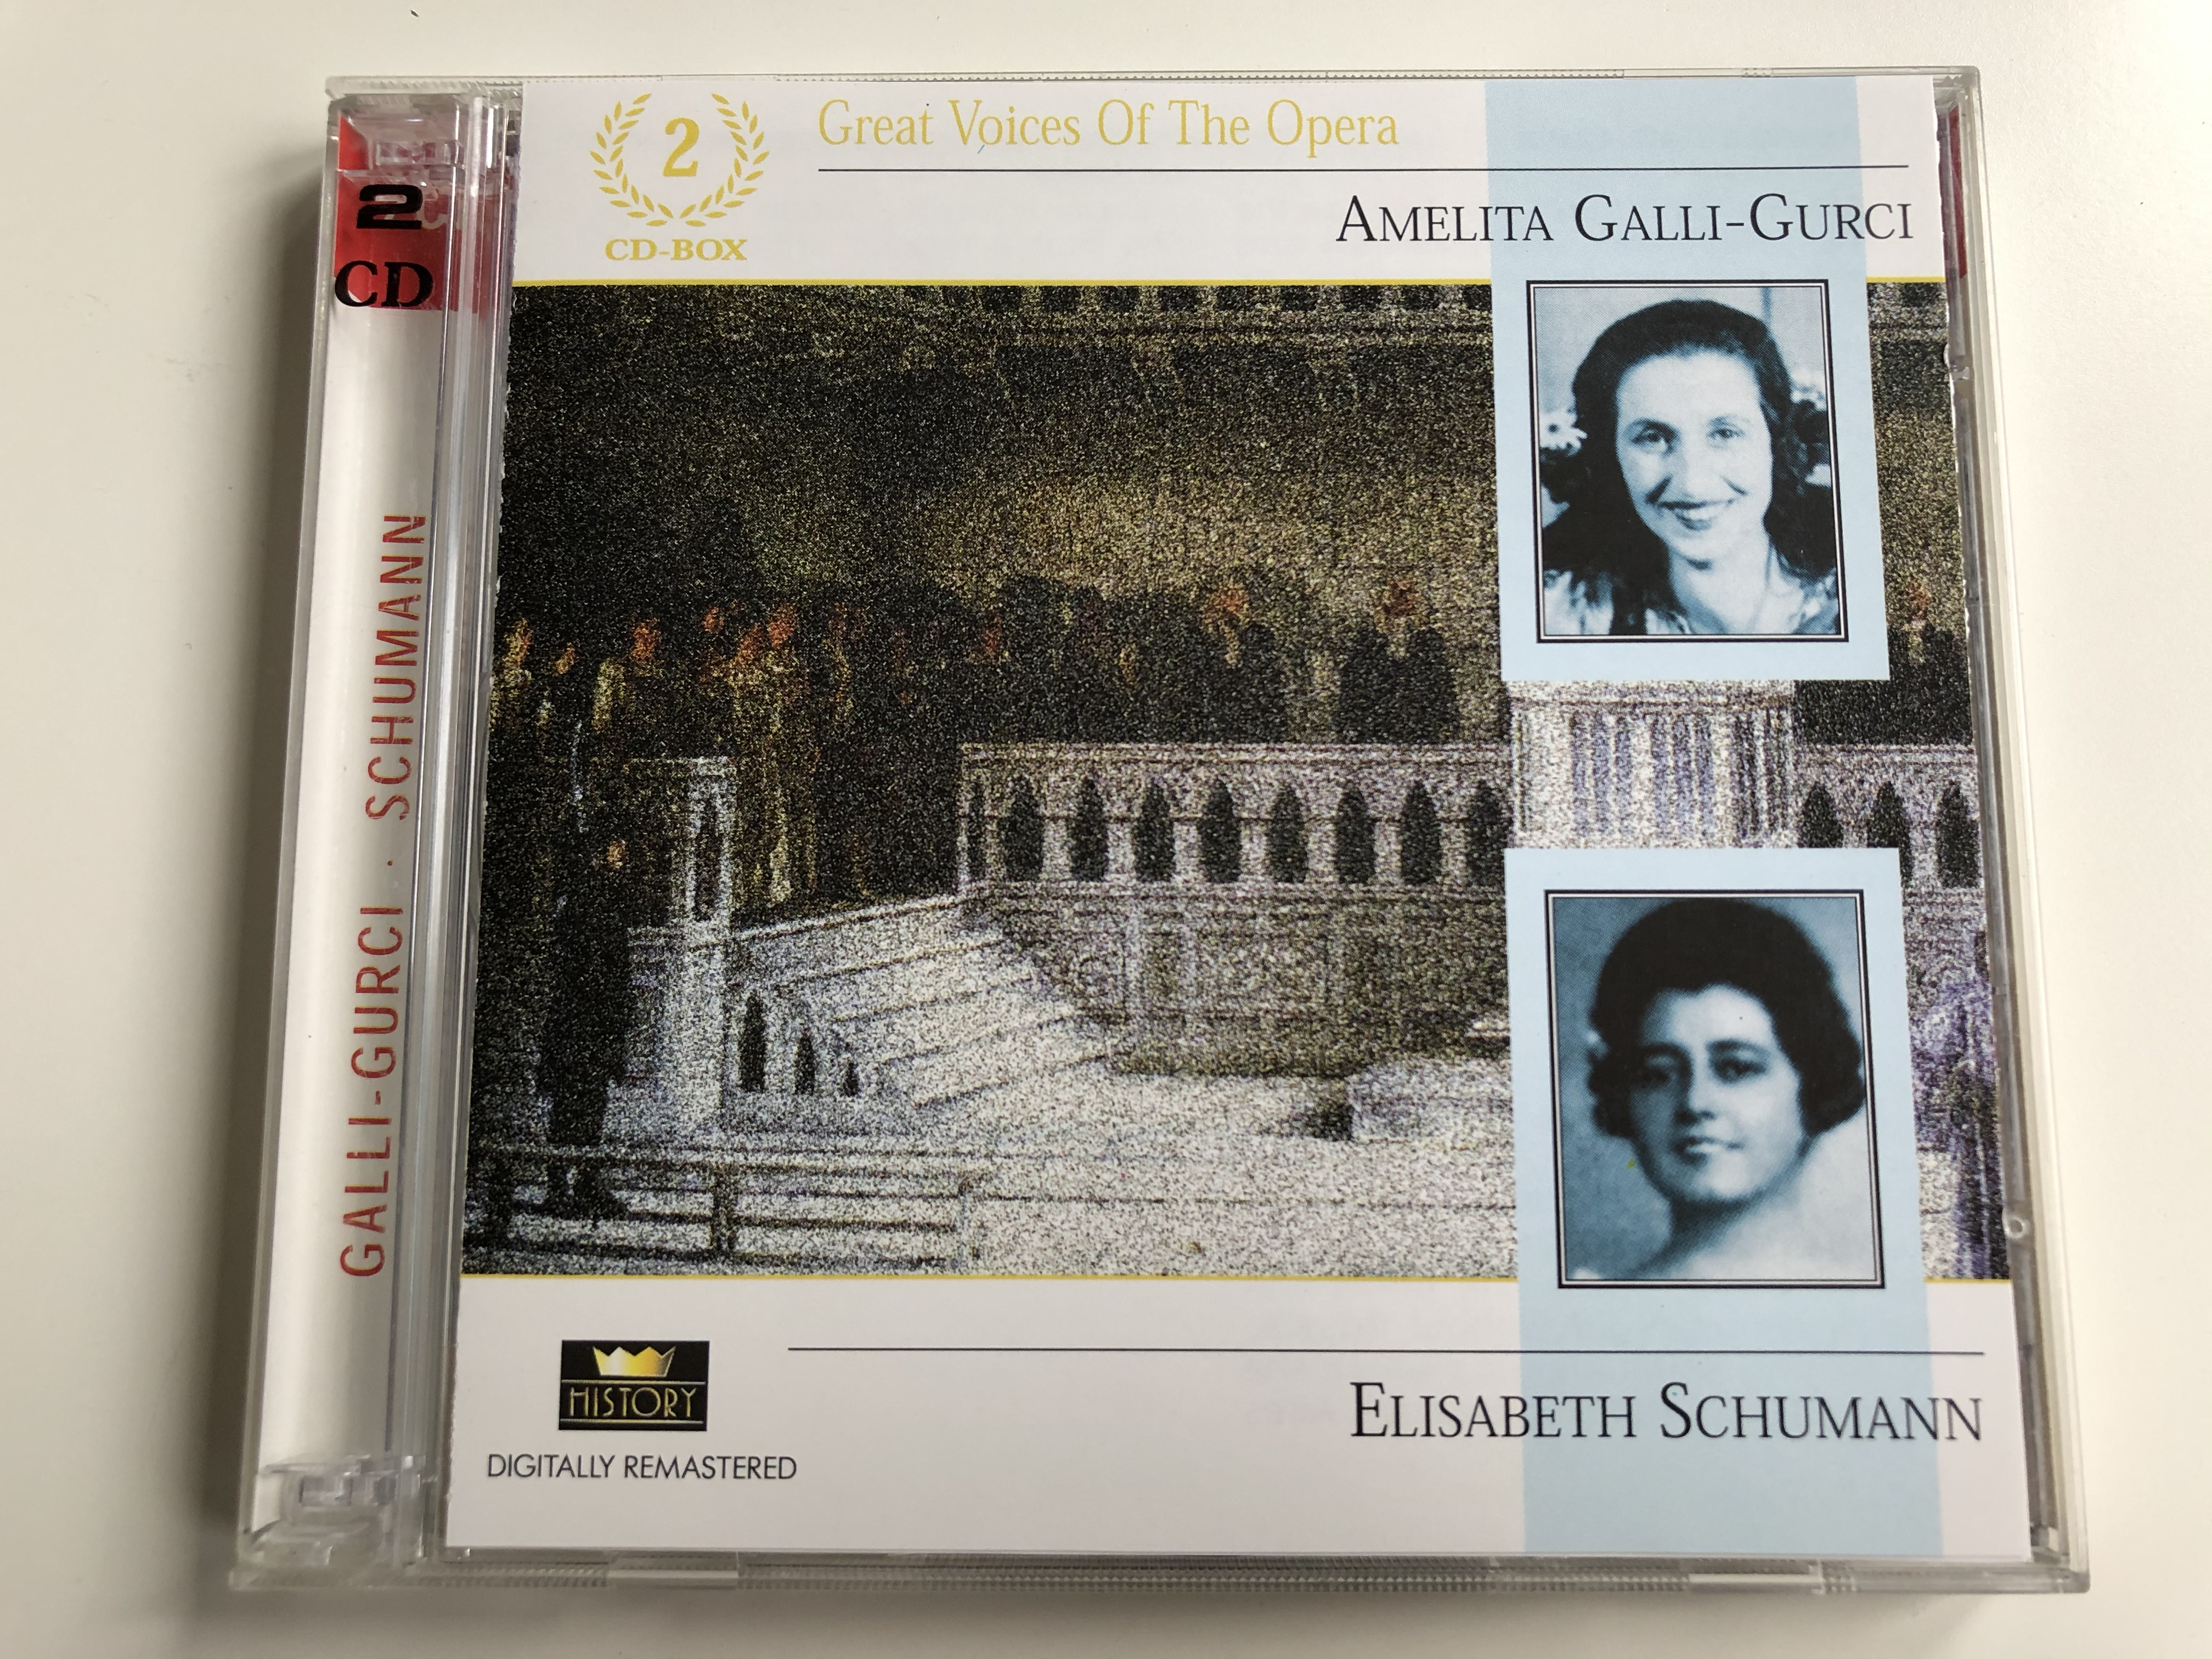 great-voices-of-the-opera-amelita-galli-gurci-elisabeth-schumann-history-2x-audio-cd-20-1-.jpg